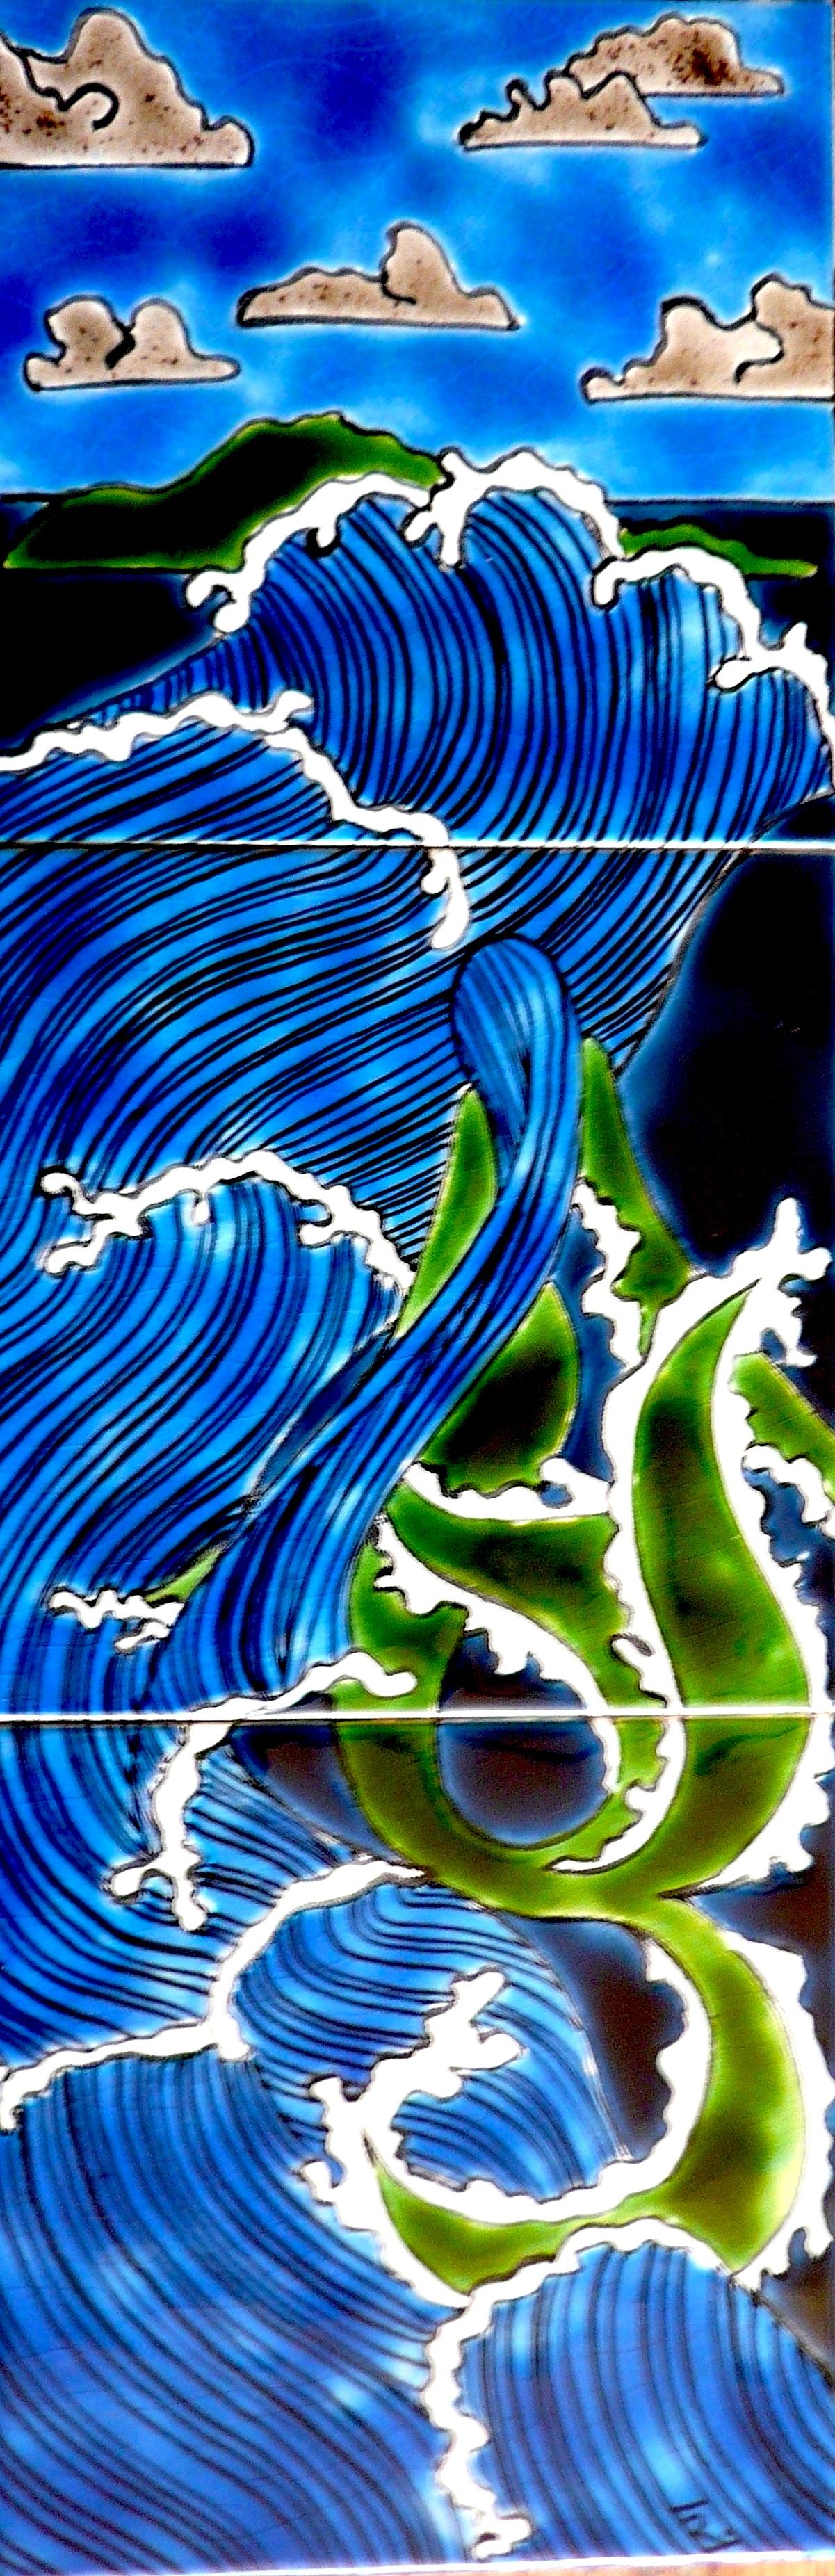 la vague merveilleuse